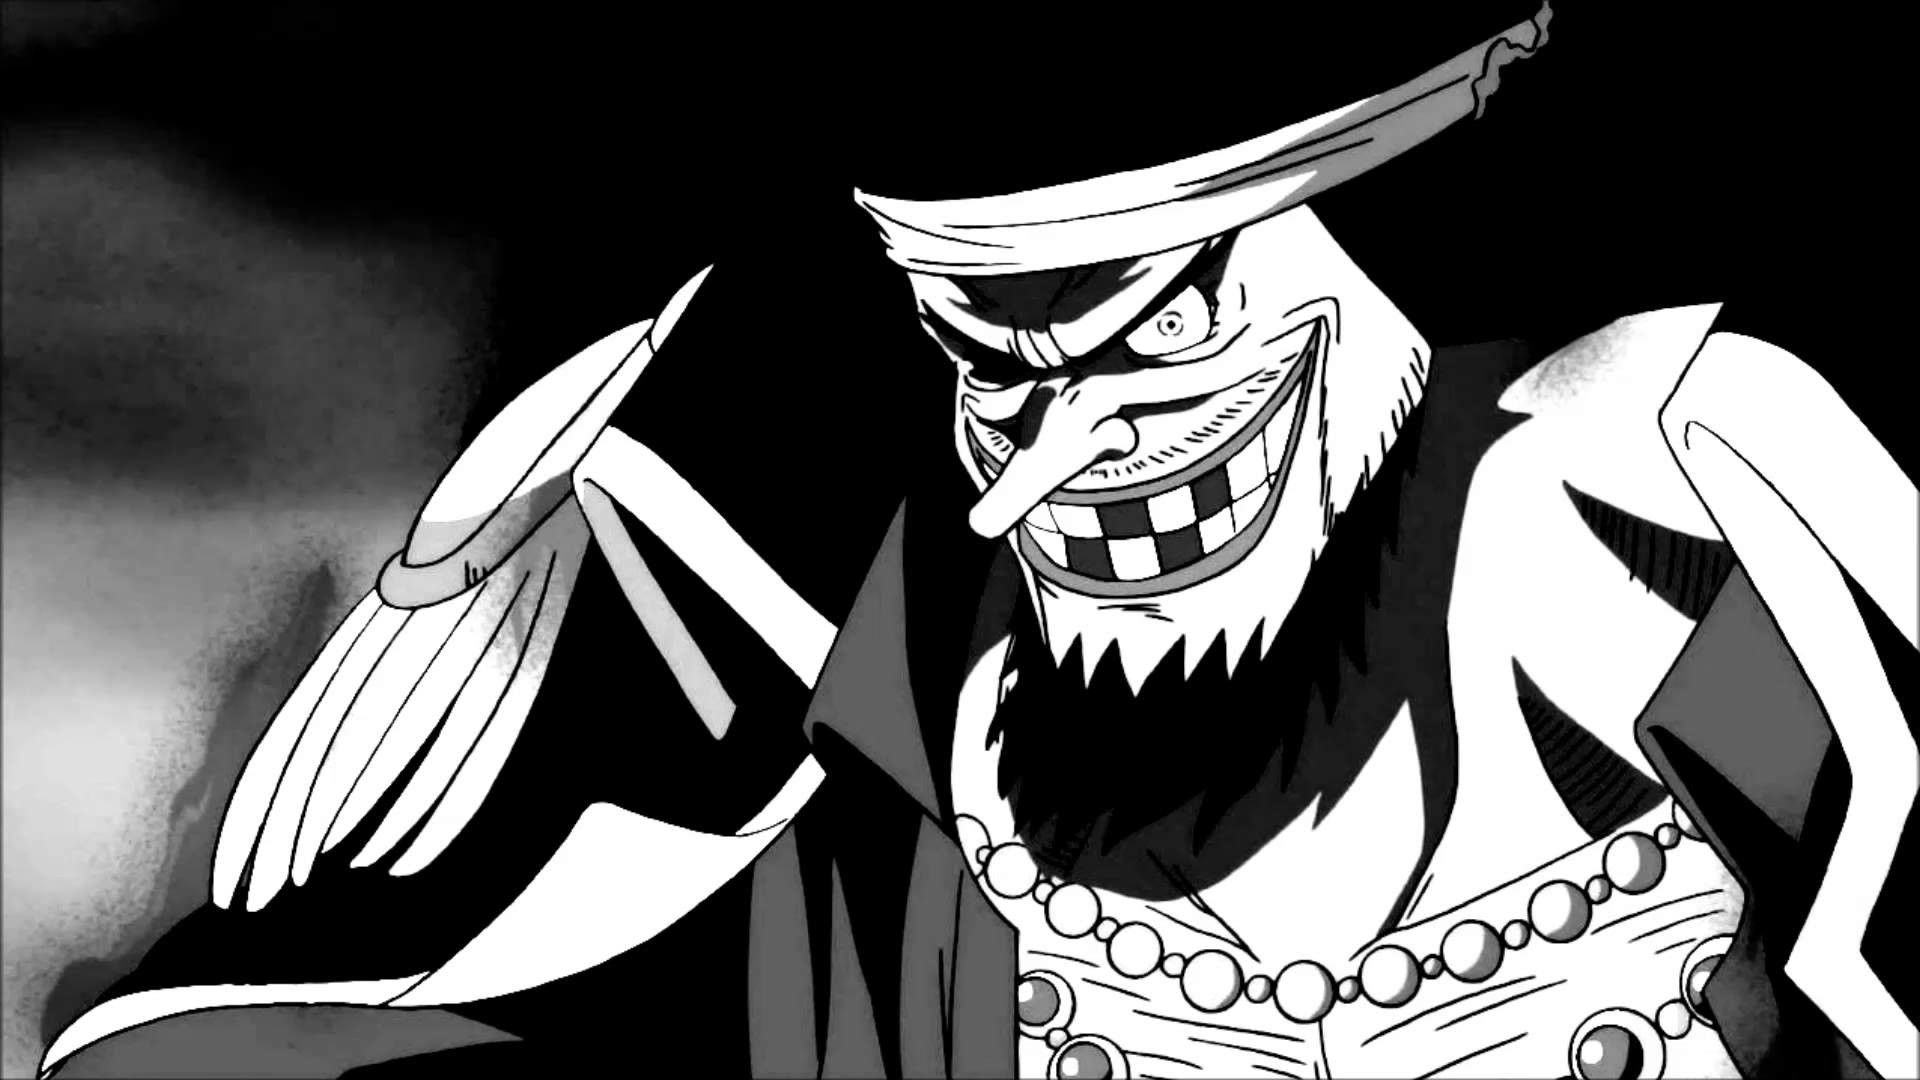 One Piece Blackbeard Wallpapers Top Free One Piece Blackbeard Backgrounds Wallpaperaccess